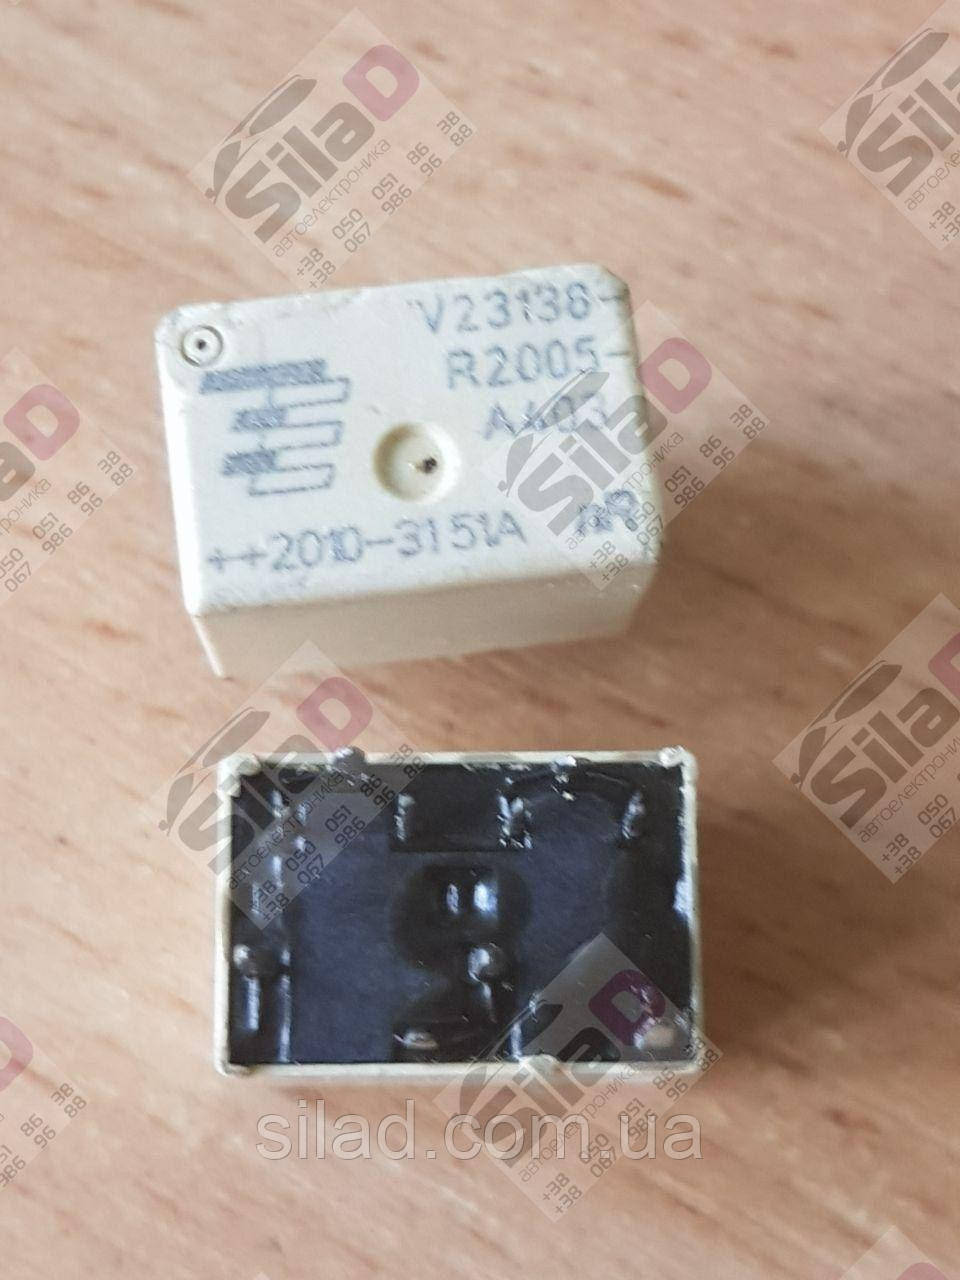 Реле V23138-R2005-A403 Tyco Electronics корпус DIP10